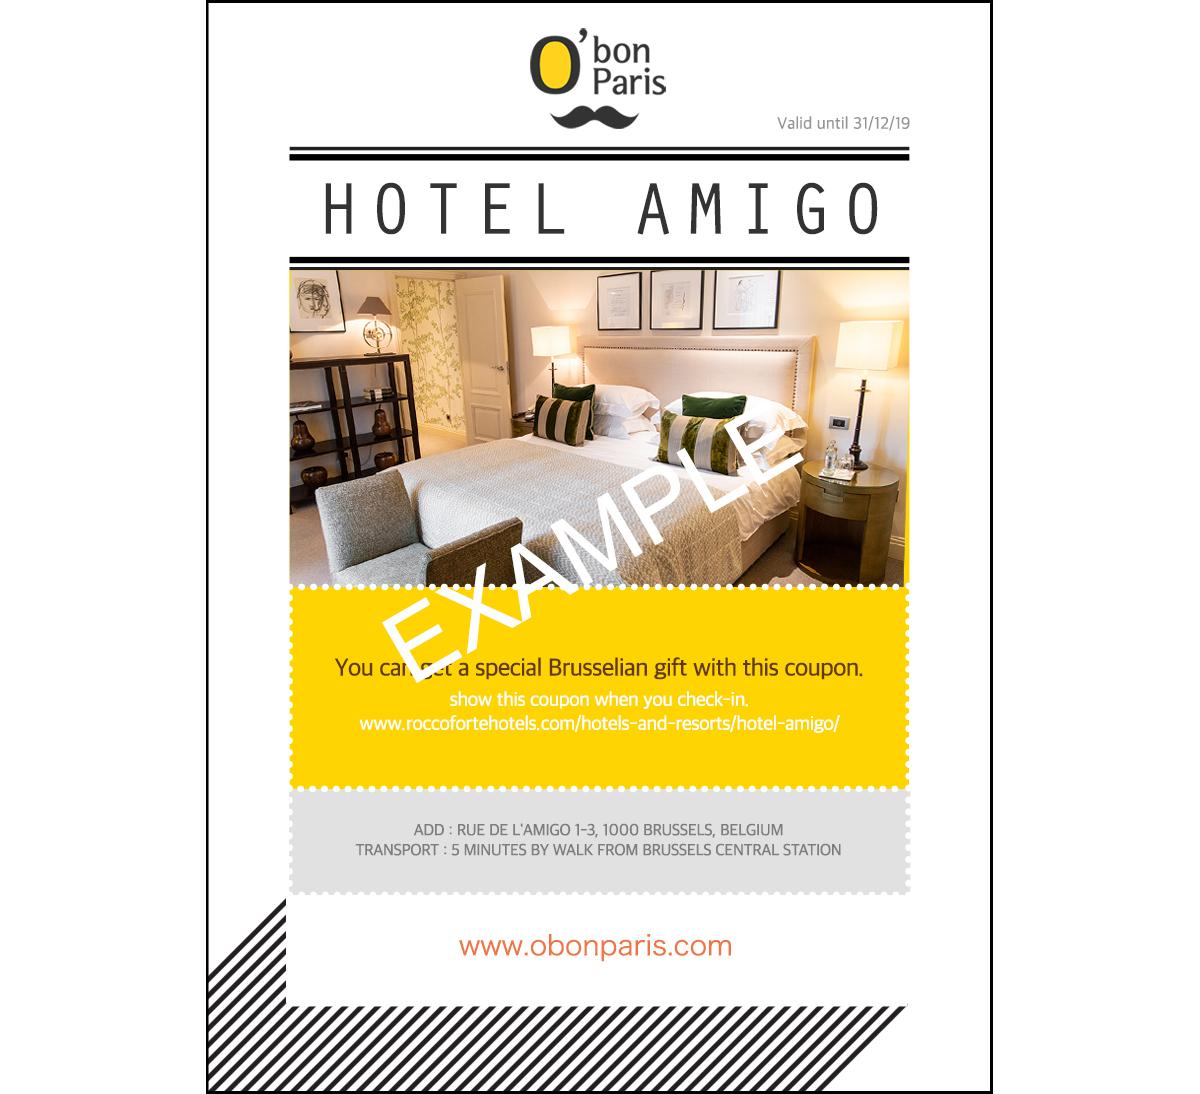 Hotel Amigo coupon